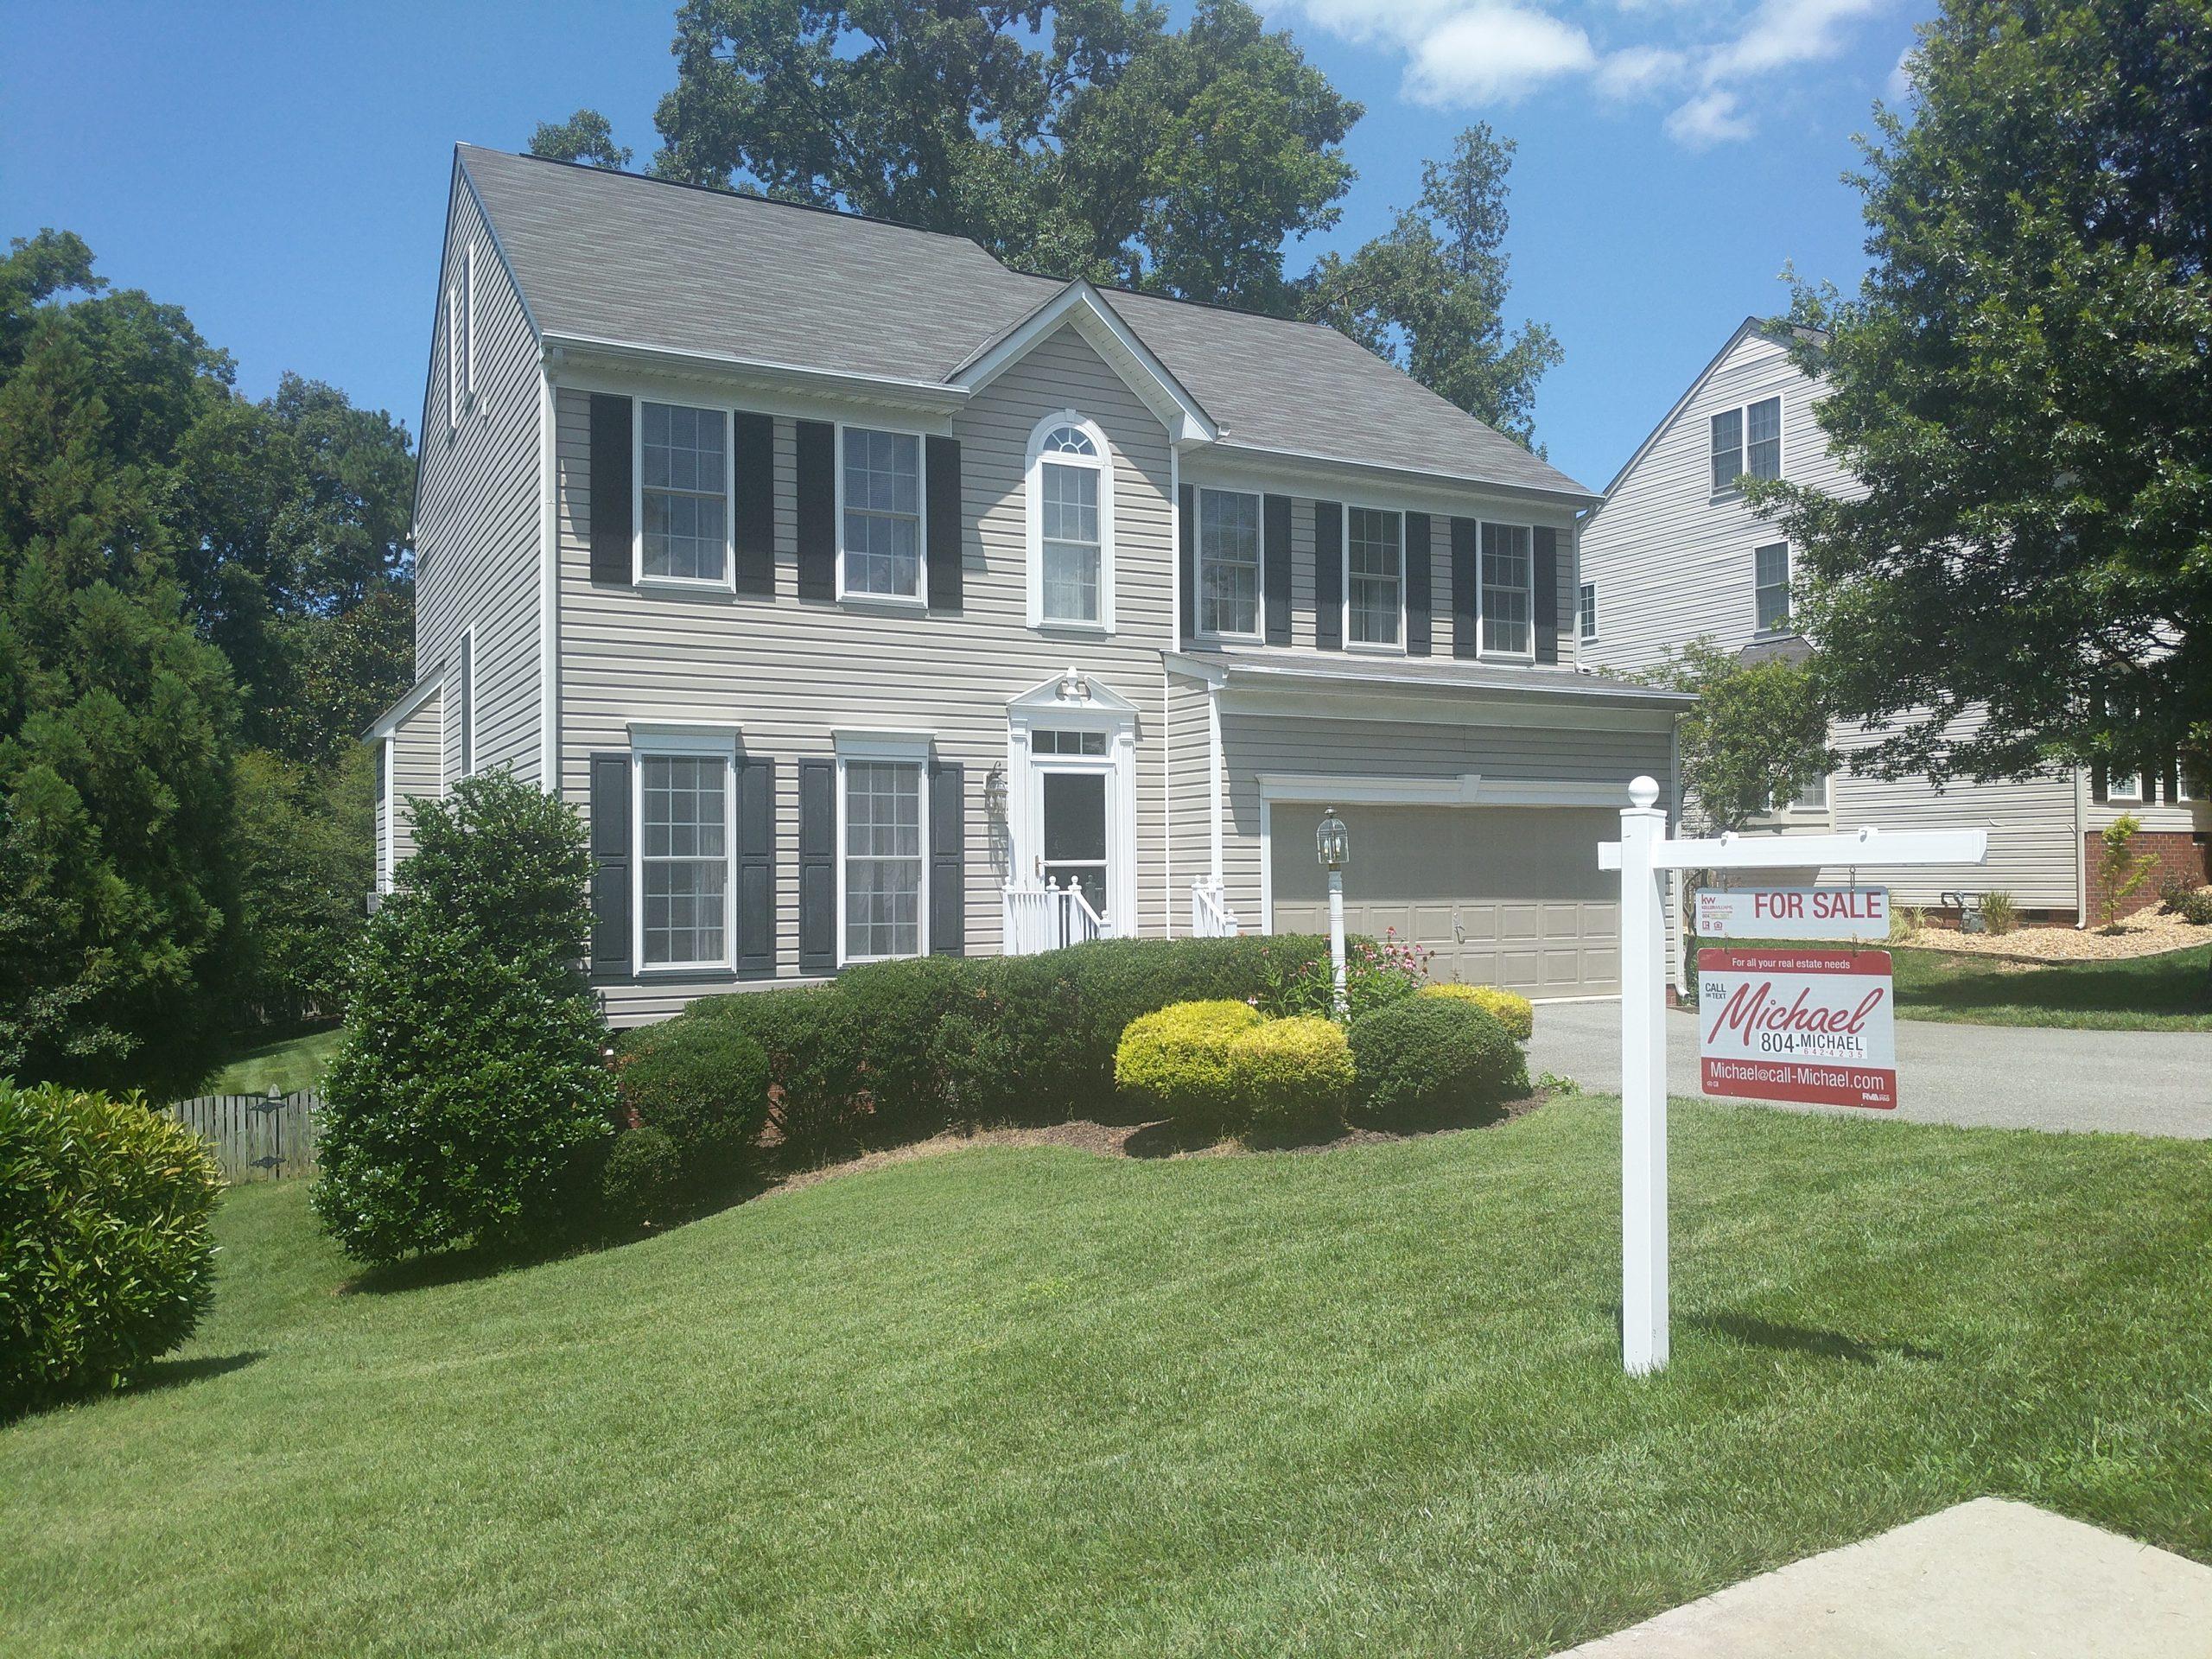 Home in Mechanicsville at 6420 Midday Lane, Mechanicsville, VA 23111